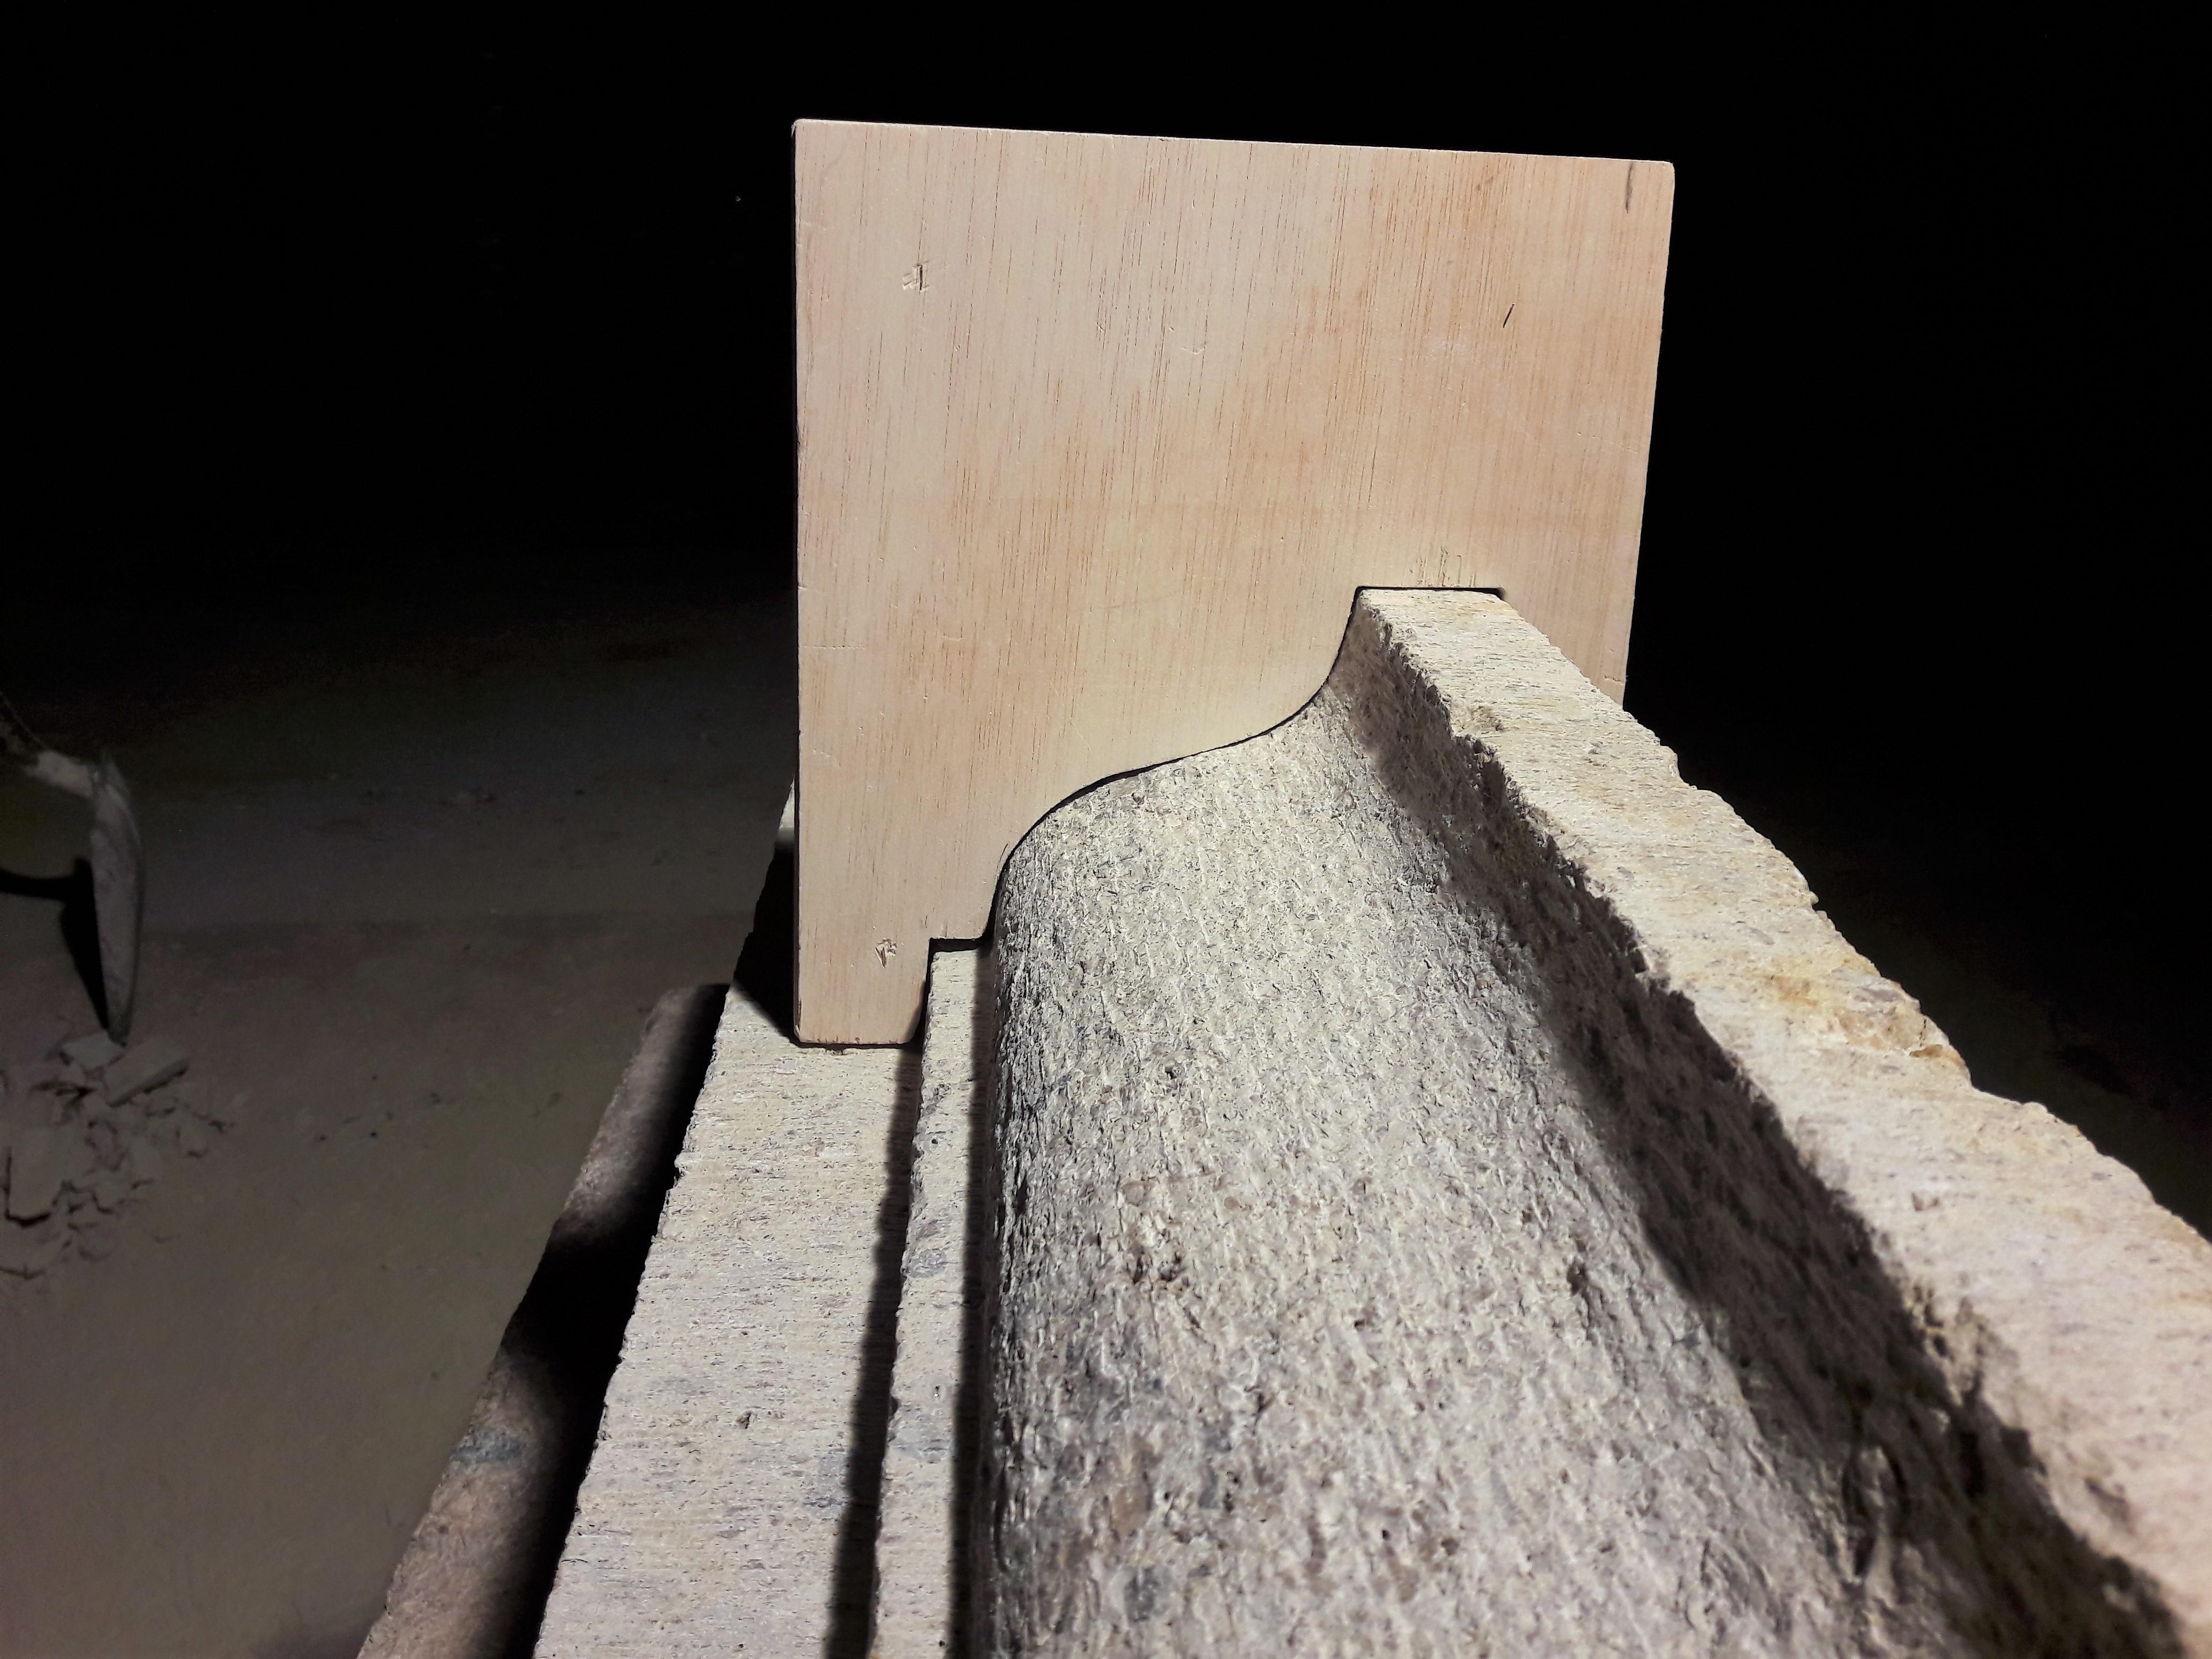 detalle-piedra-artesania-talla-3-travert